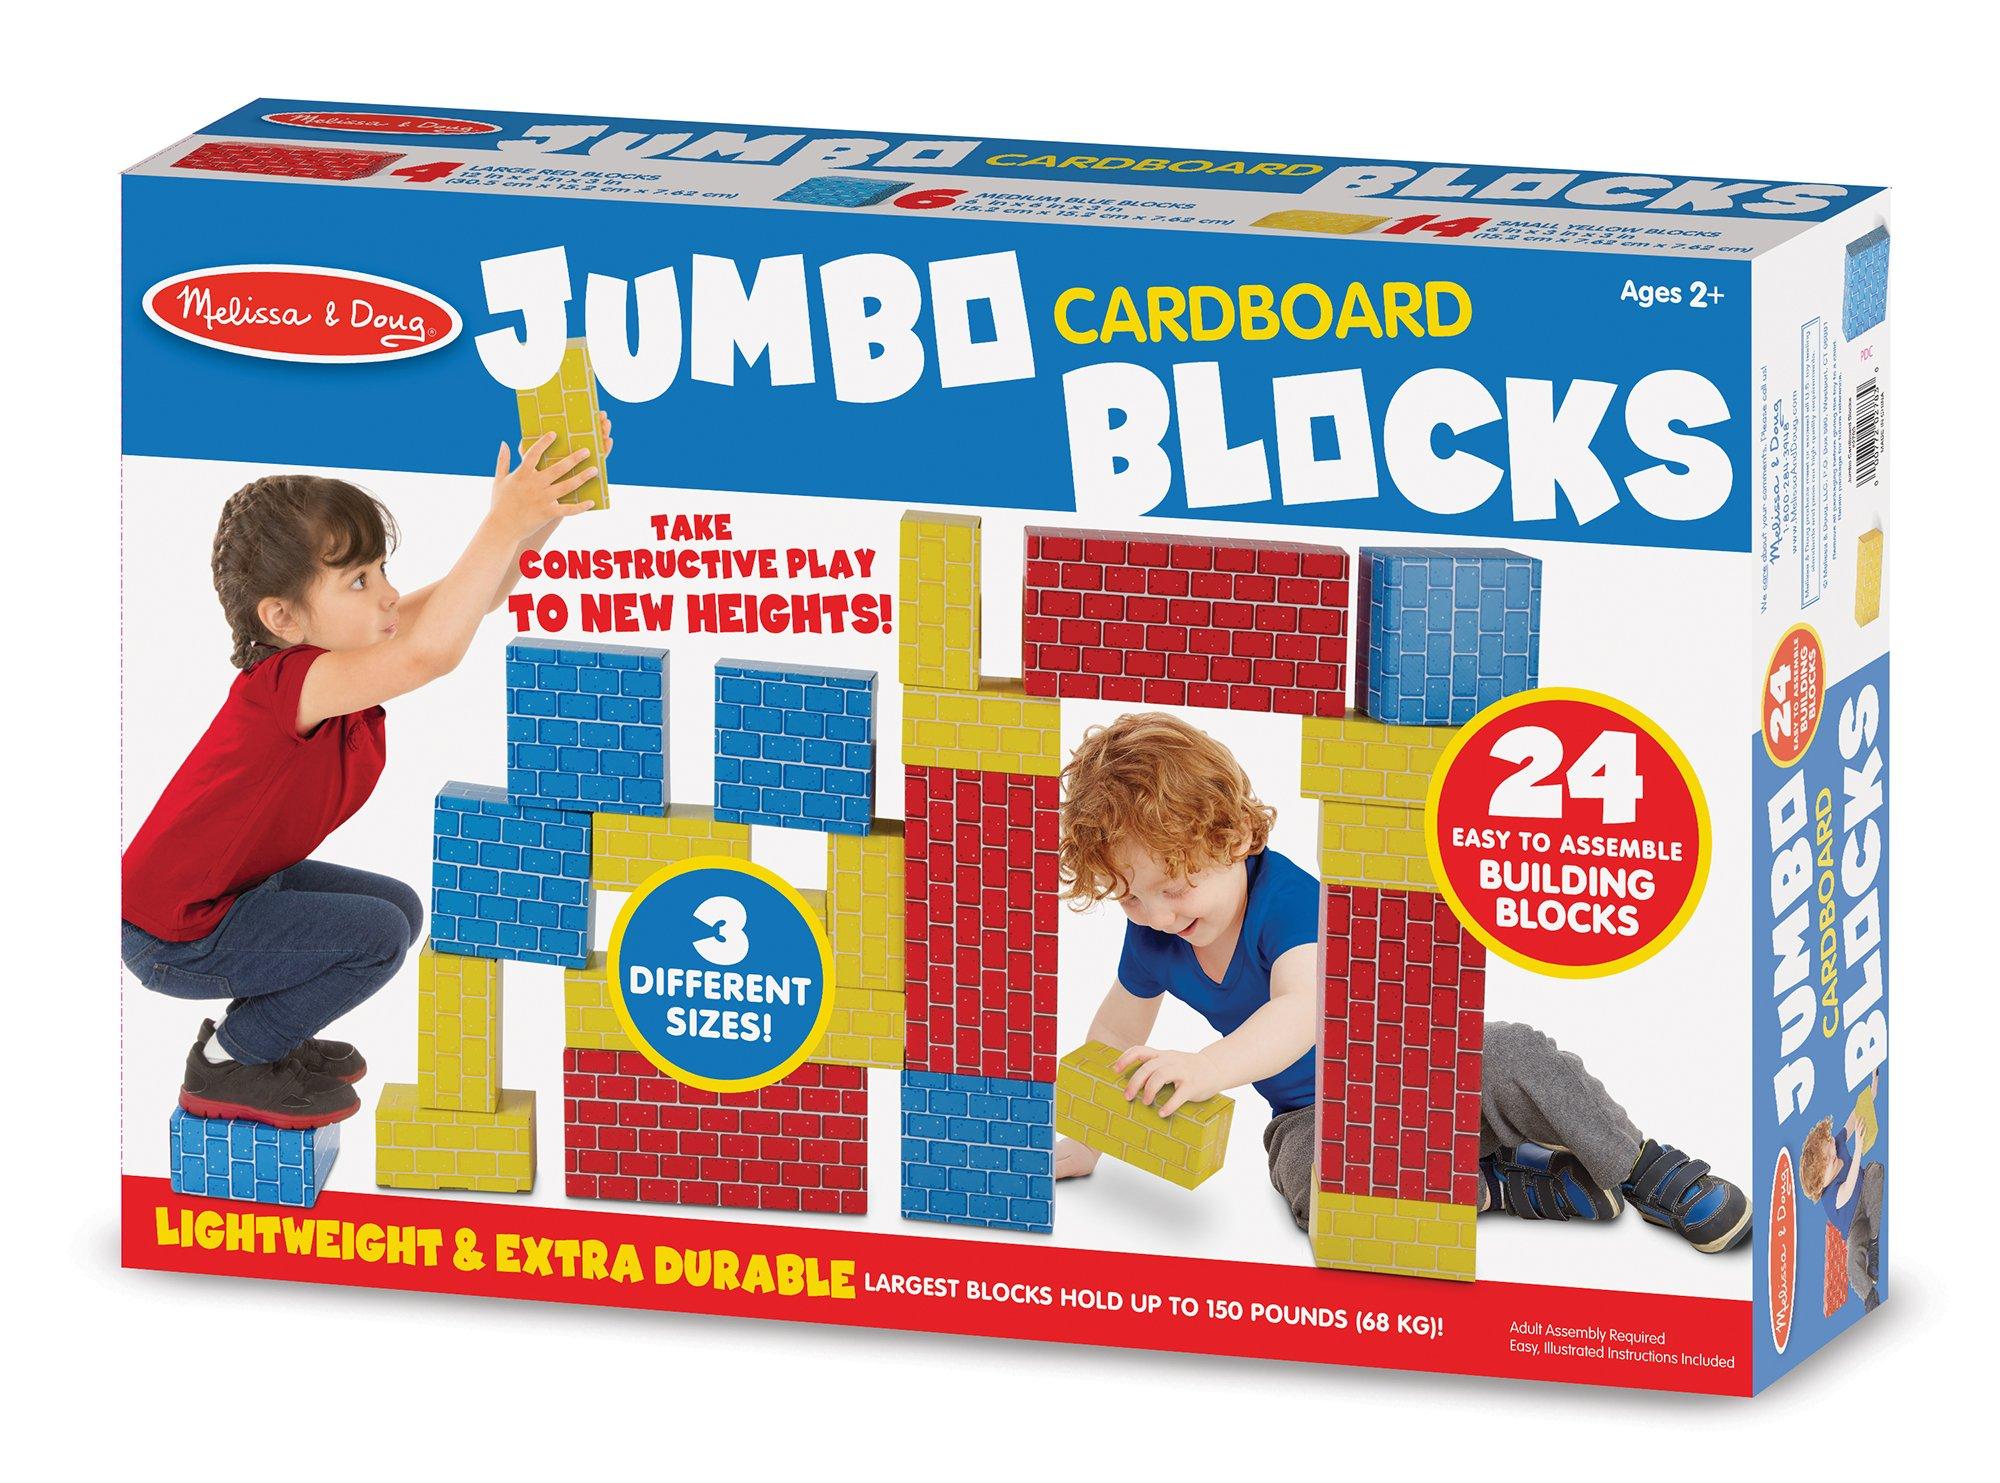 Melissa & Doug Extra-Thick Cardboard Building Blocks - 24 Blocks in 3 Sizes by Melissa & Doug (Image #4)